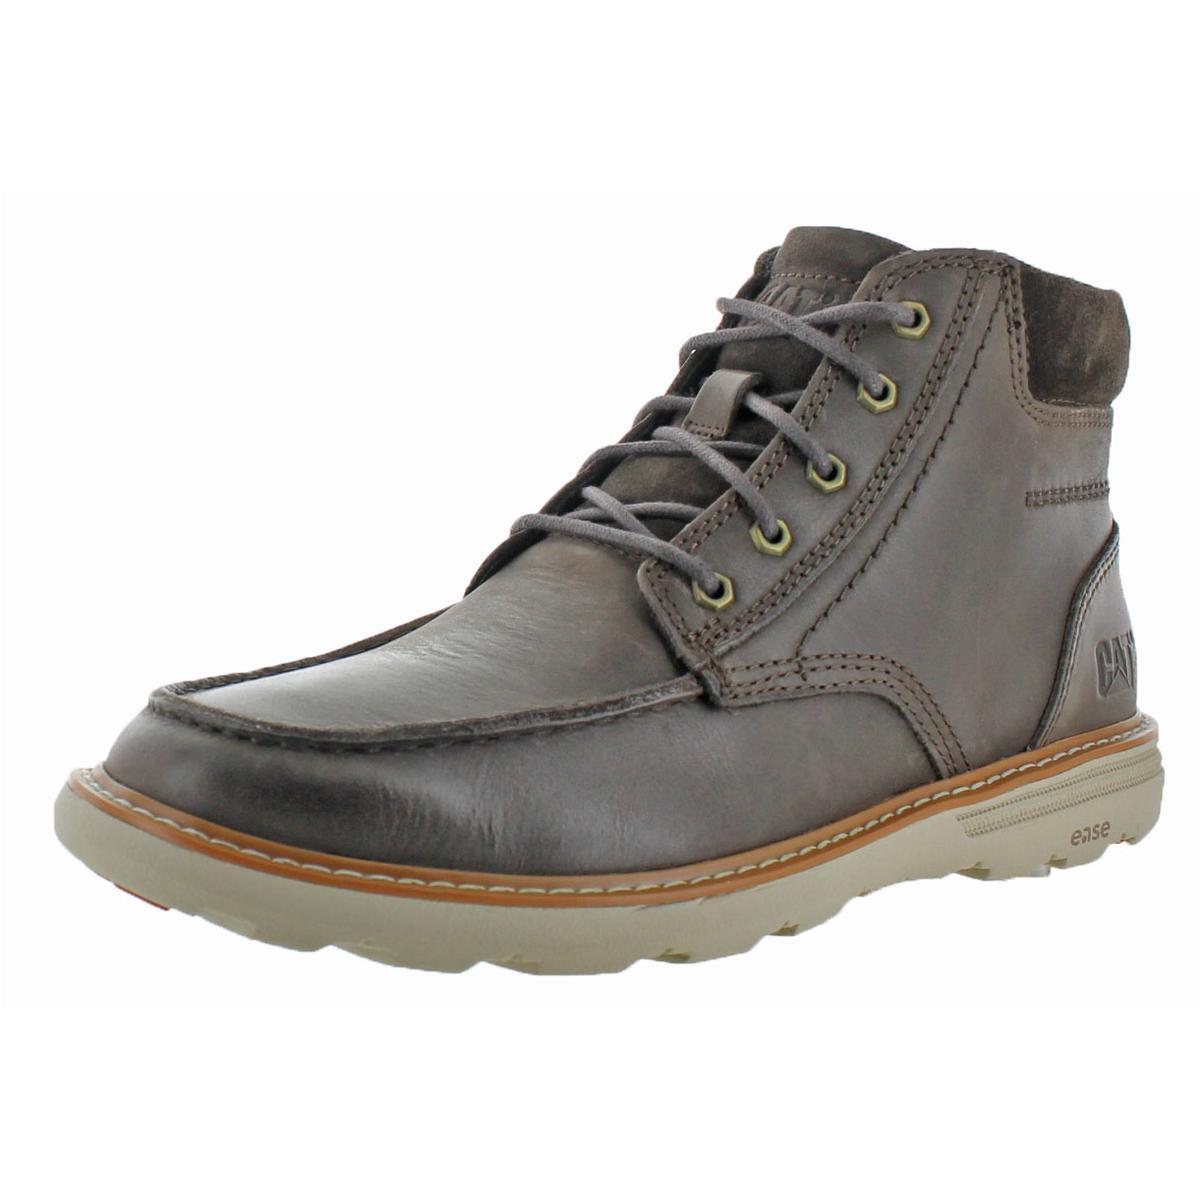 Caterpillar Mens Colorado Tan Ankle Boots Shoes 8.5 Medium (D) BHFO 6446